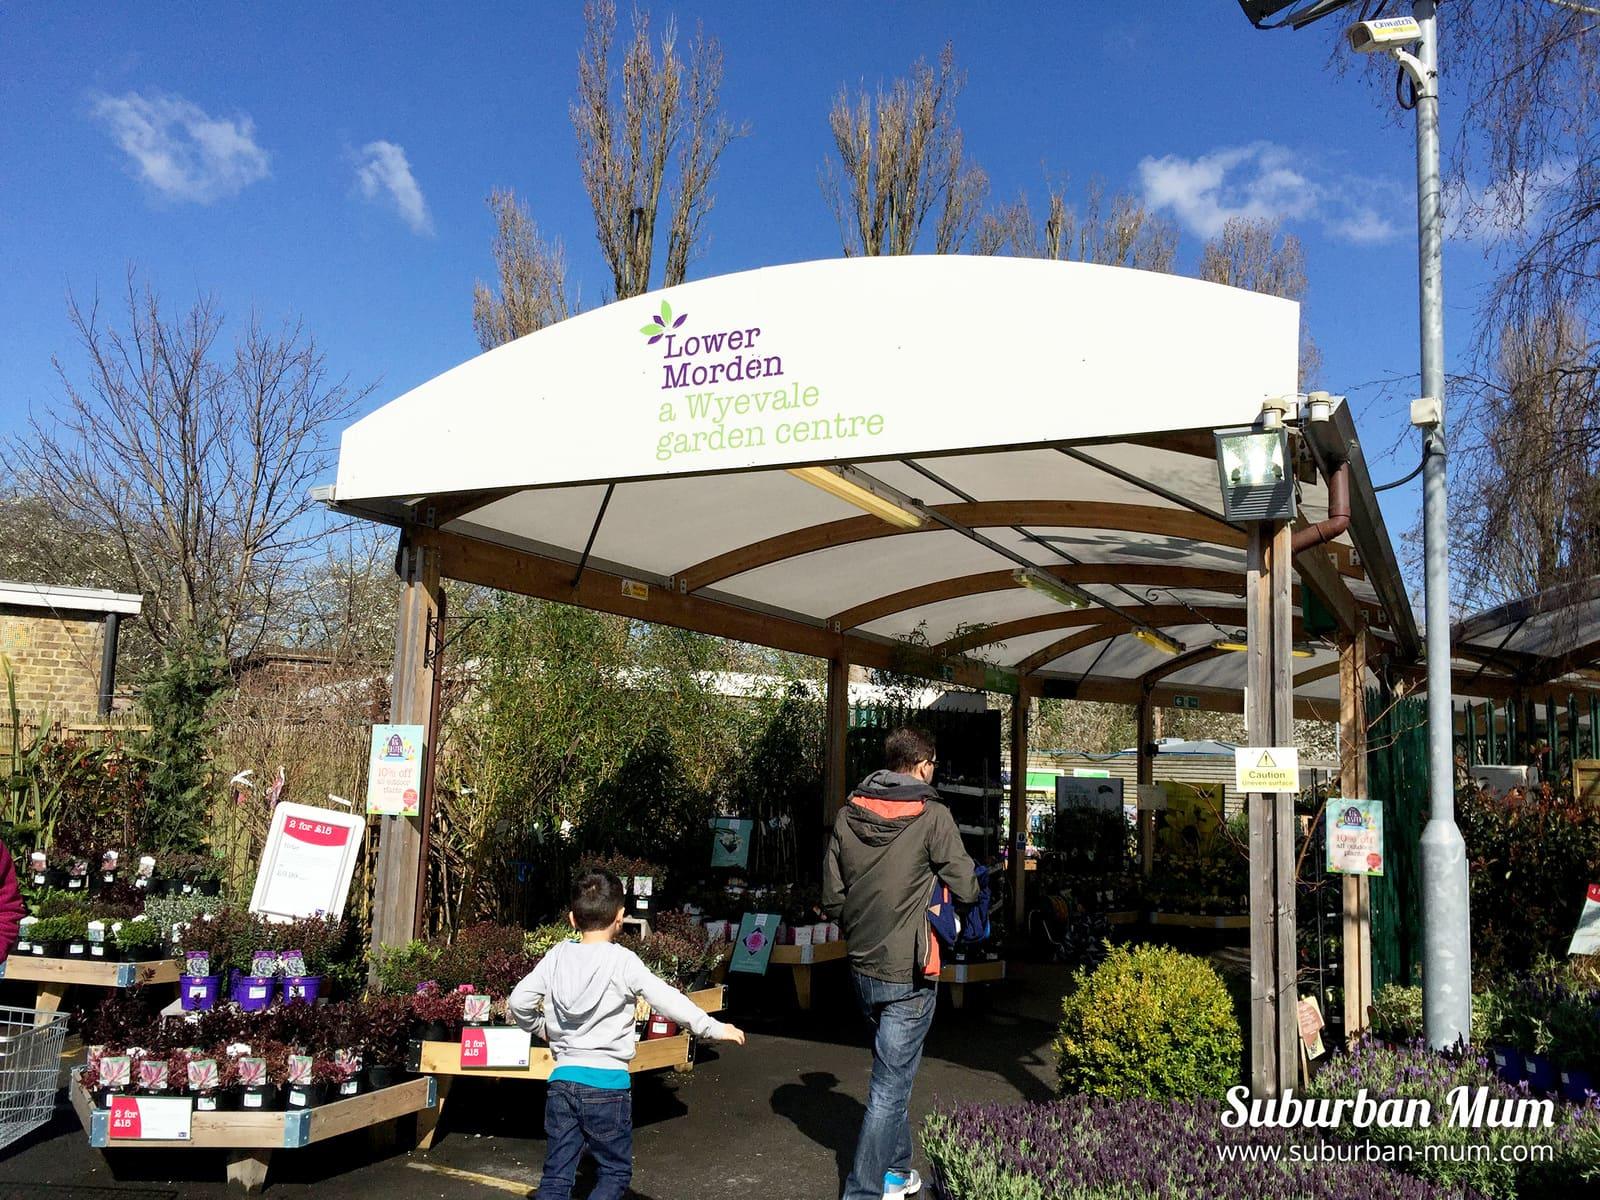 Wyevale Garden Centre, Lower Morden